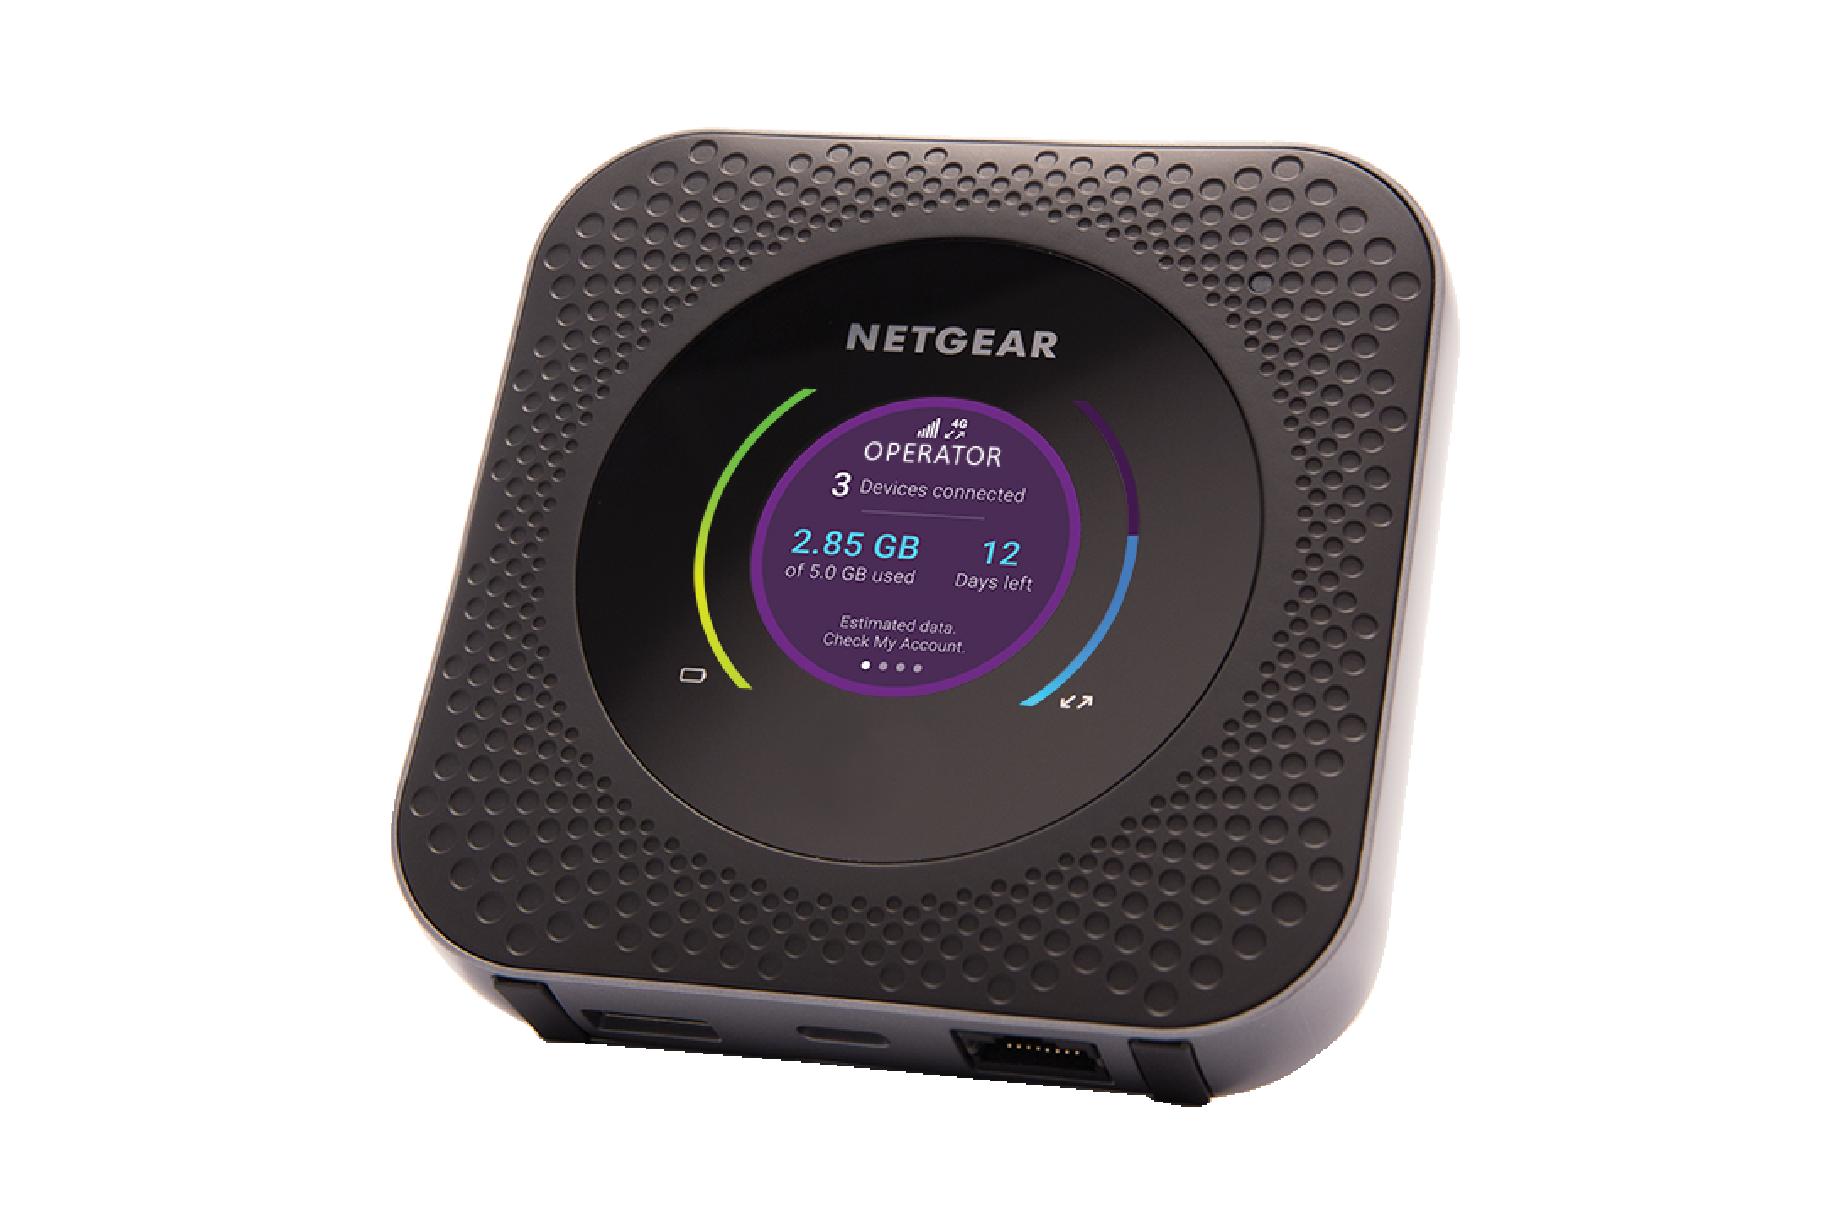 Mr1100 Mobile Routers Mobile Service Providers Netgear